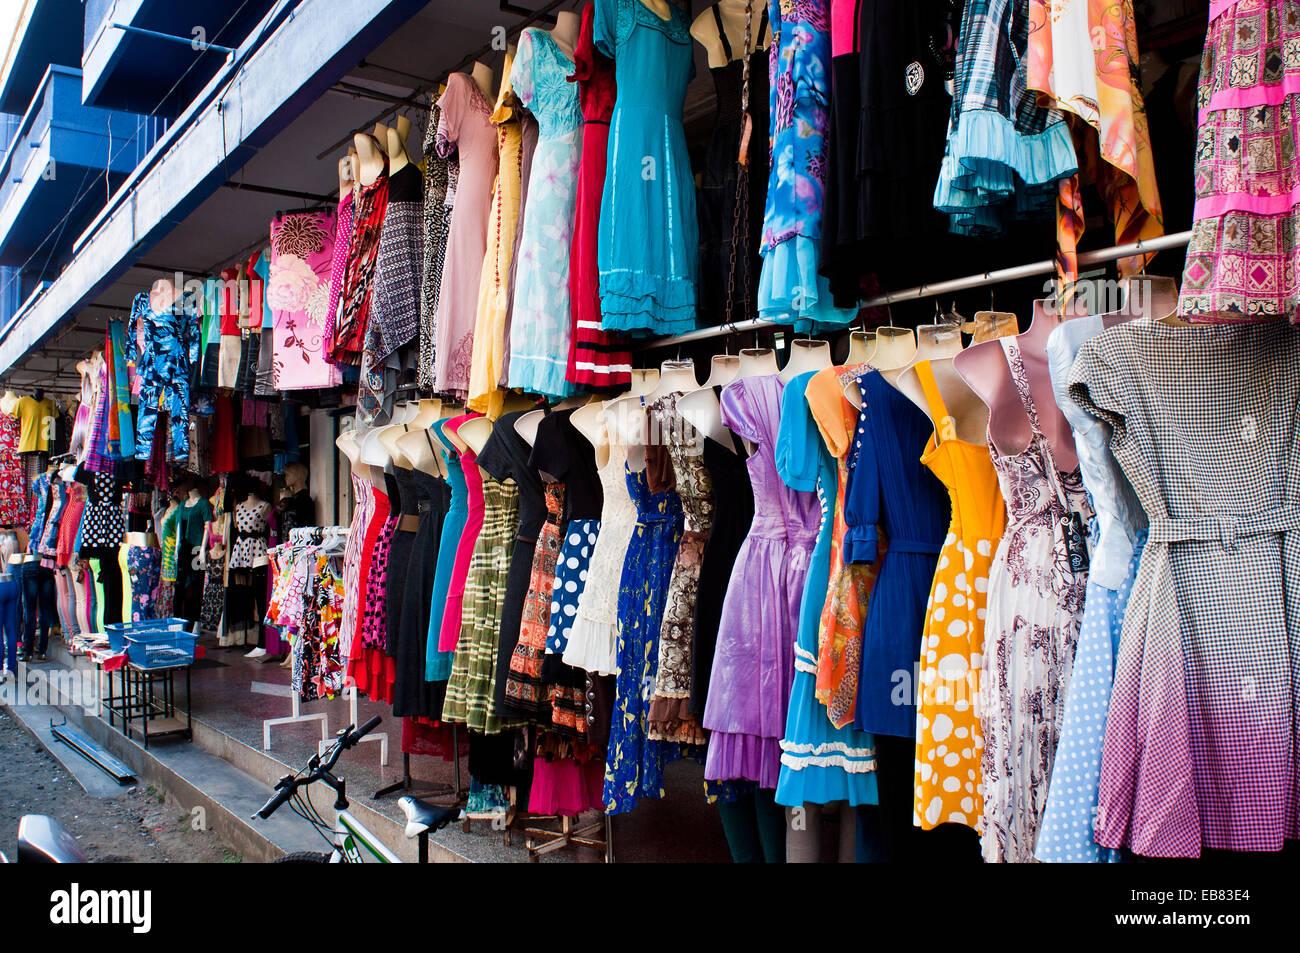 Mauritius clothing stores